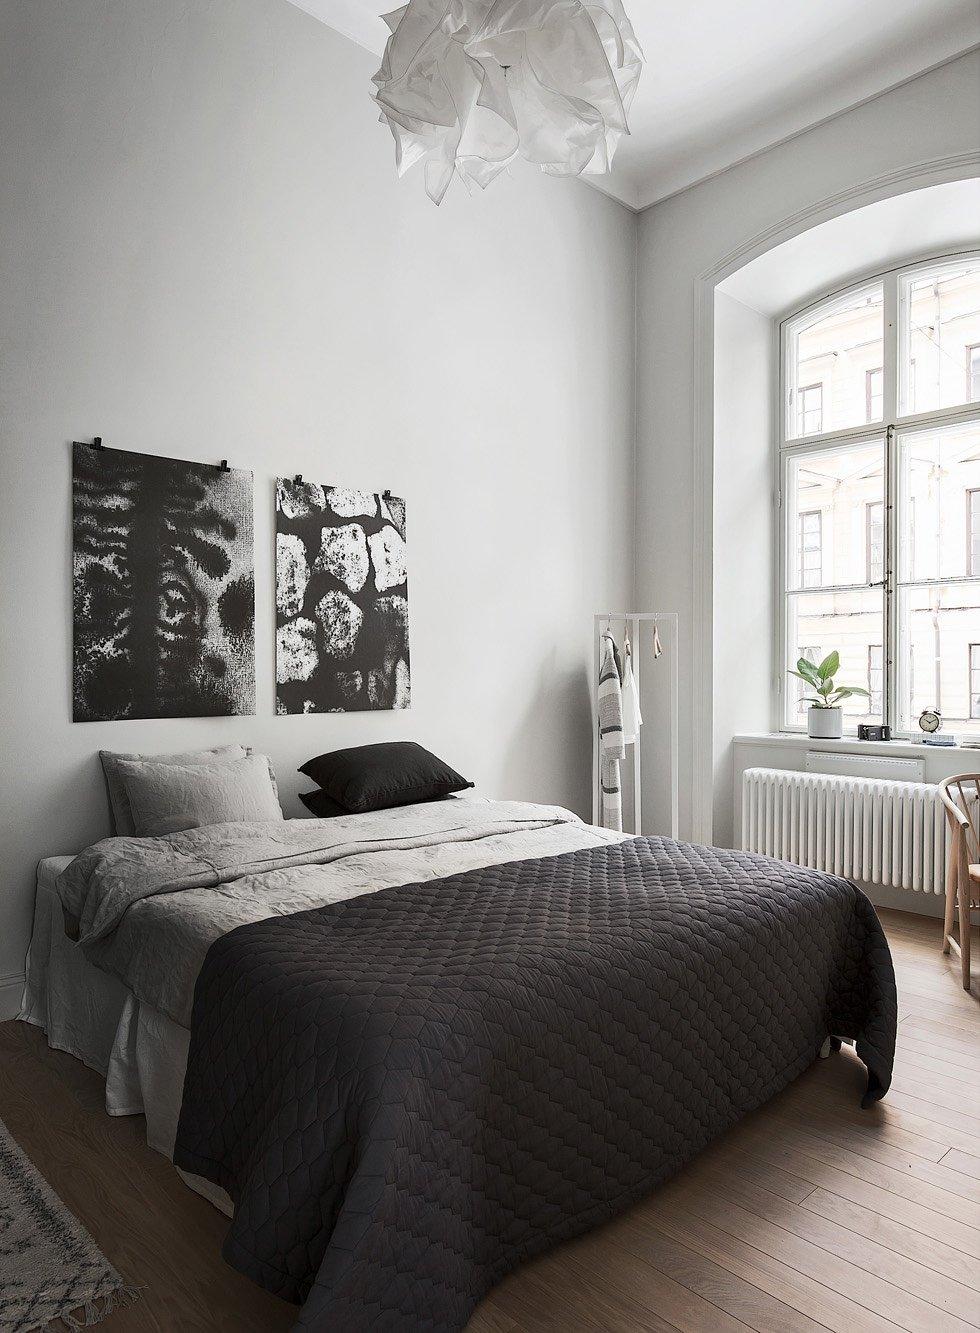 40 Minimalist Bedroom Ideas | Less is More | Homelovr on Bedroom Minimalist Design Ideas  id=41063